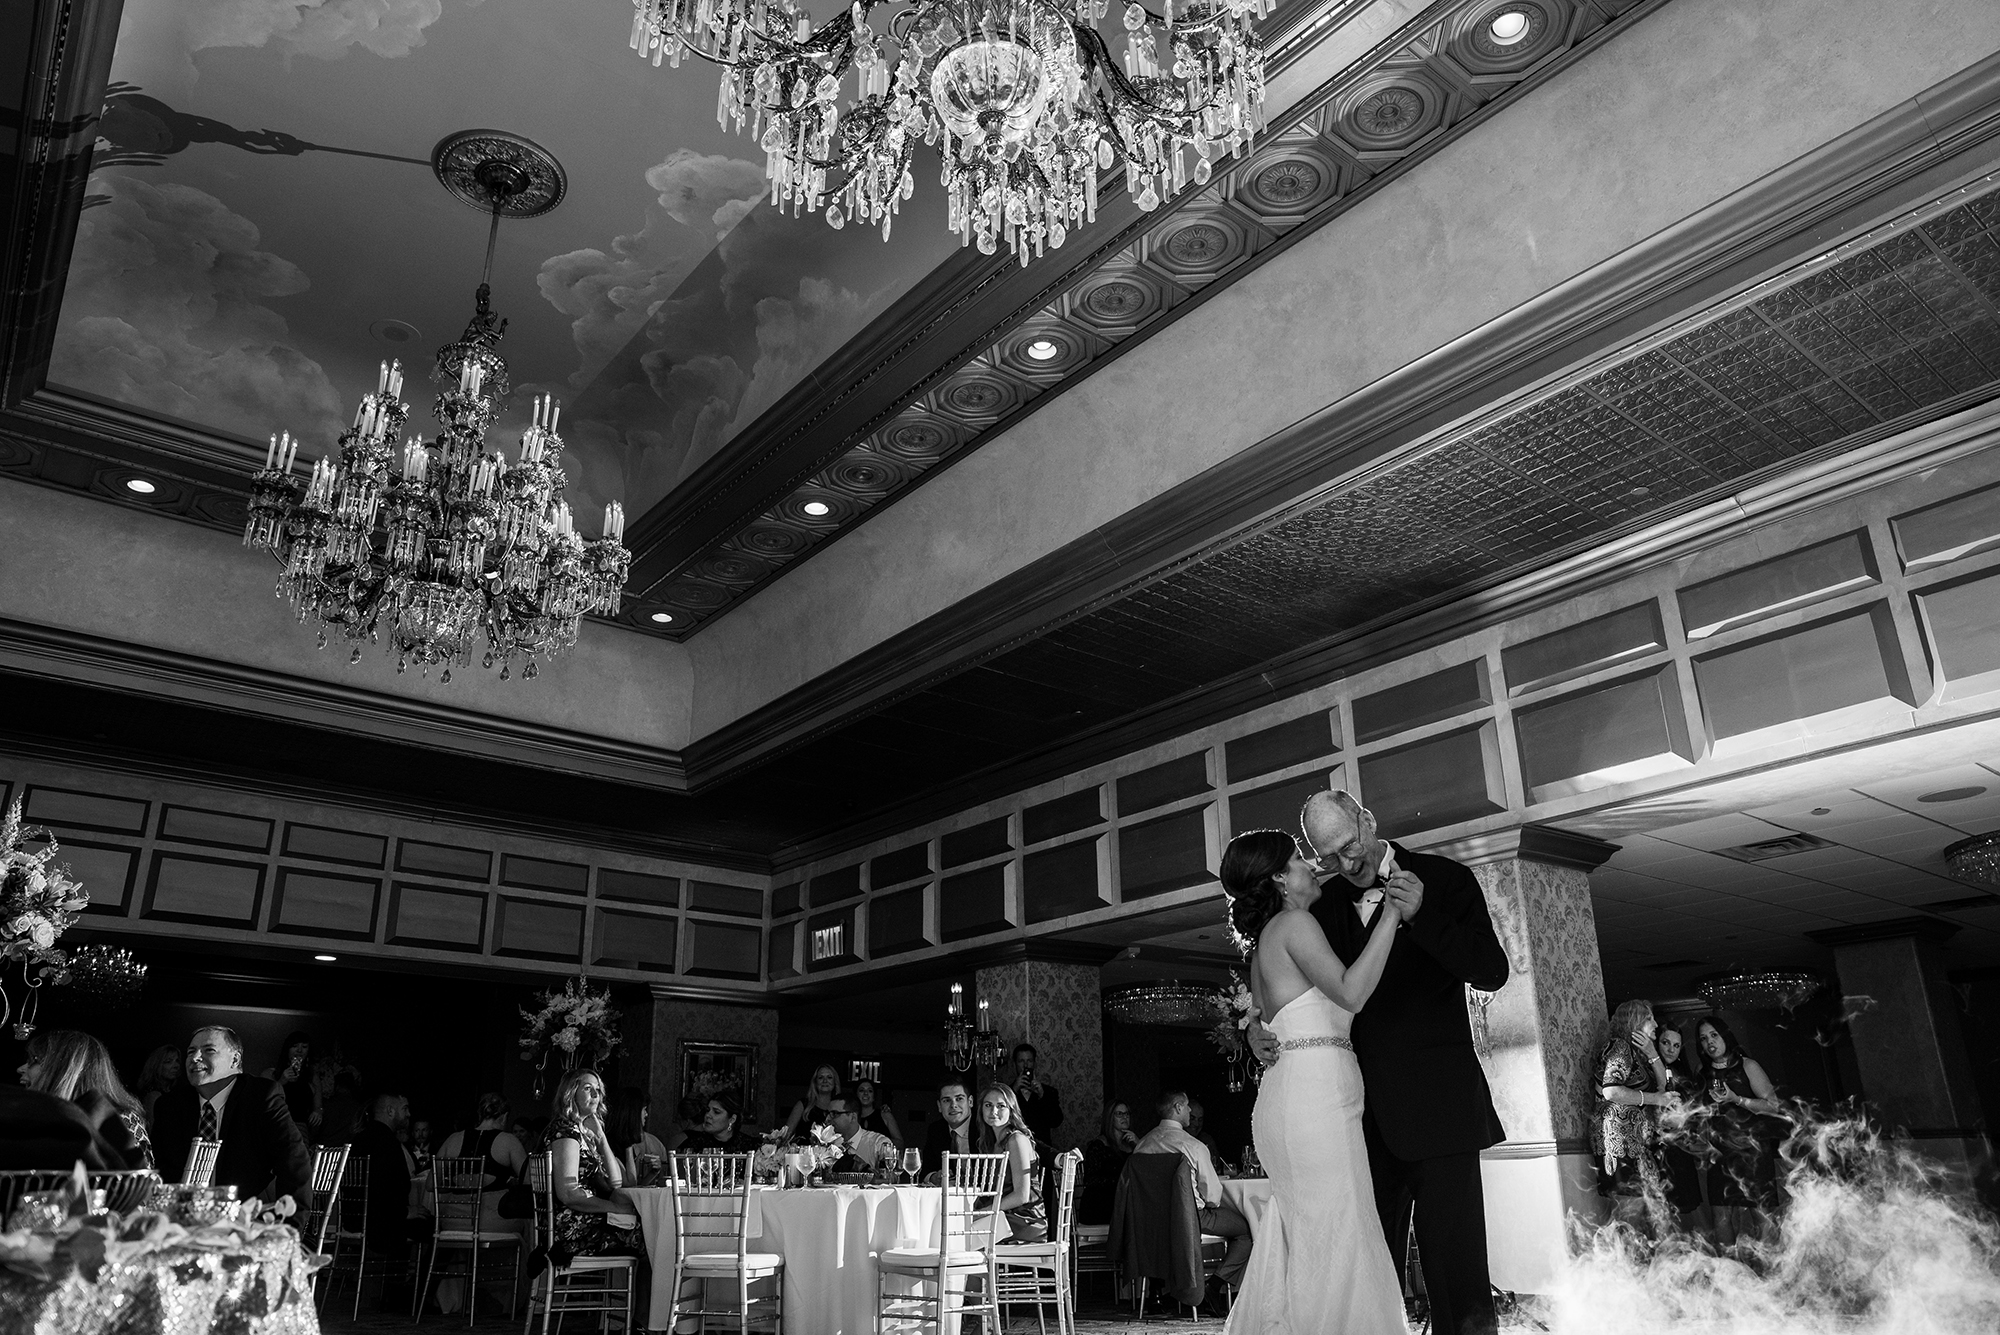 lbi-photographer-ac-wedding-claridge-val-28.jpg